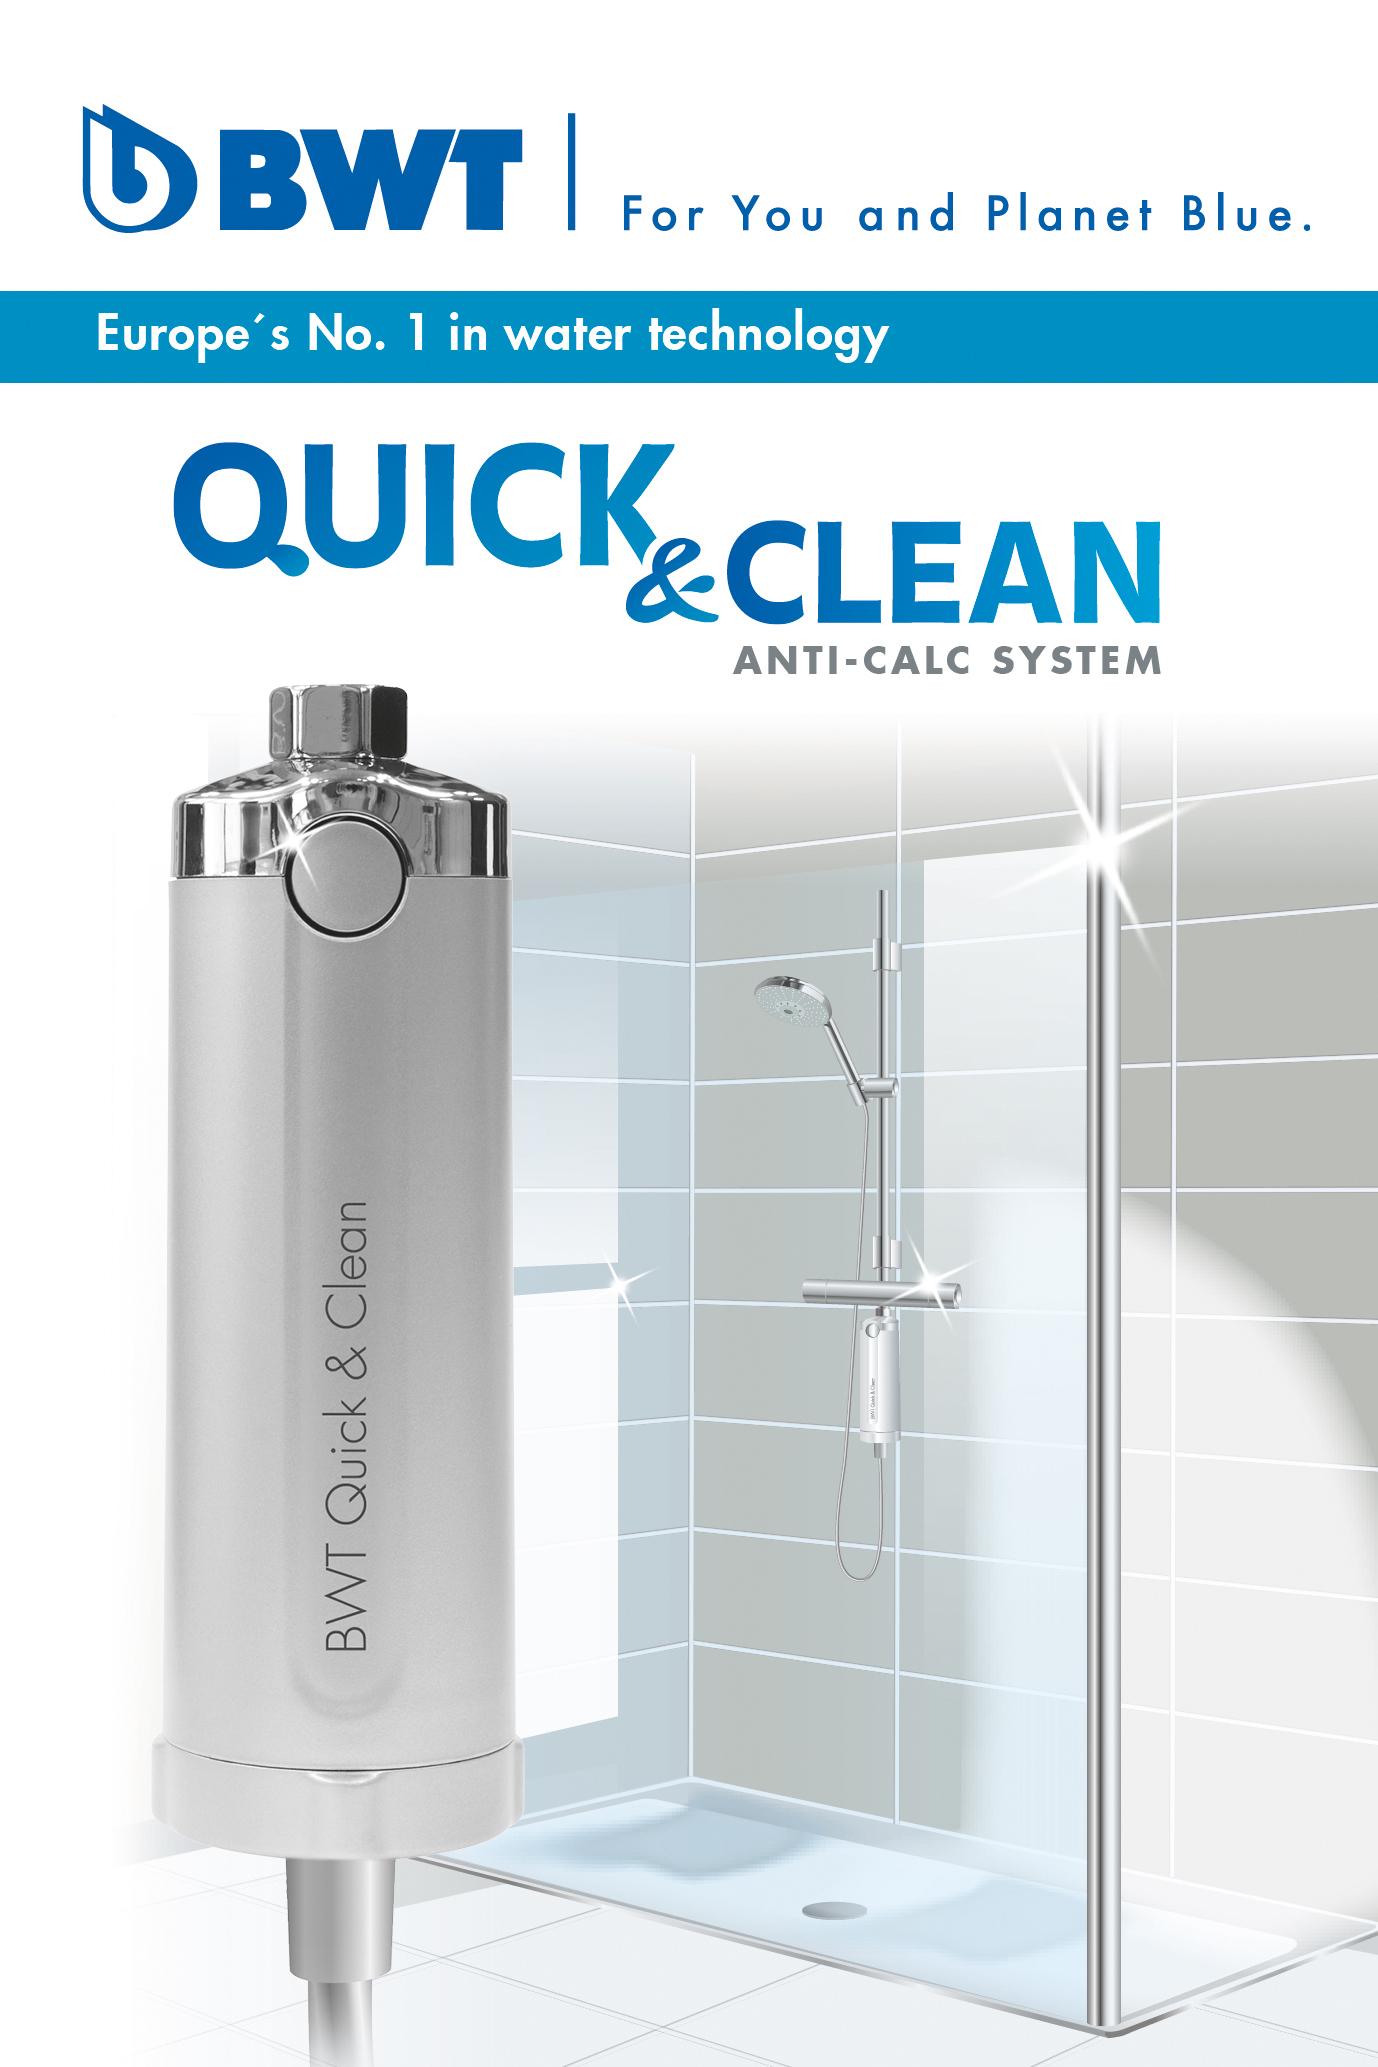 bwt quick clean antikalk filter strahlender glanz in dusche bad neu ebay. Black Bedroom Furniture Sets. Home Design Ideas